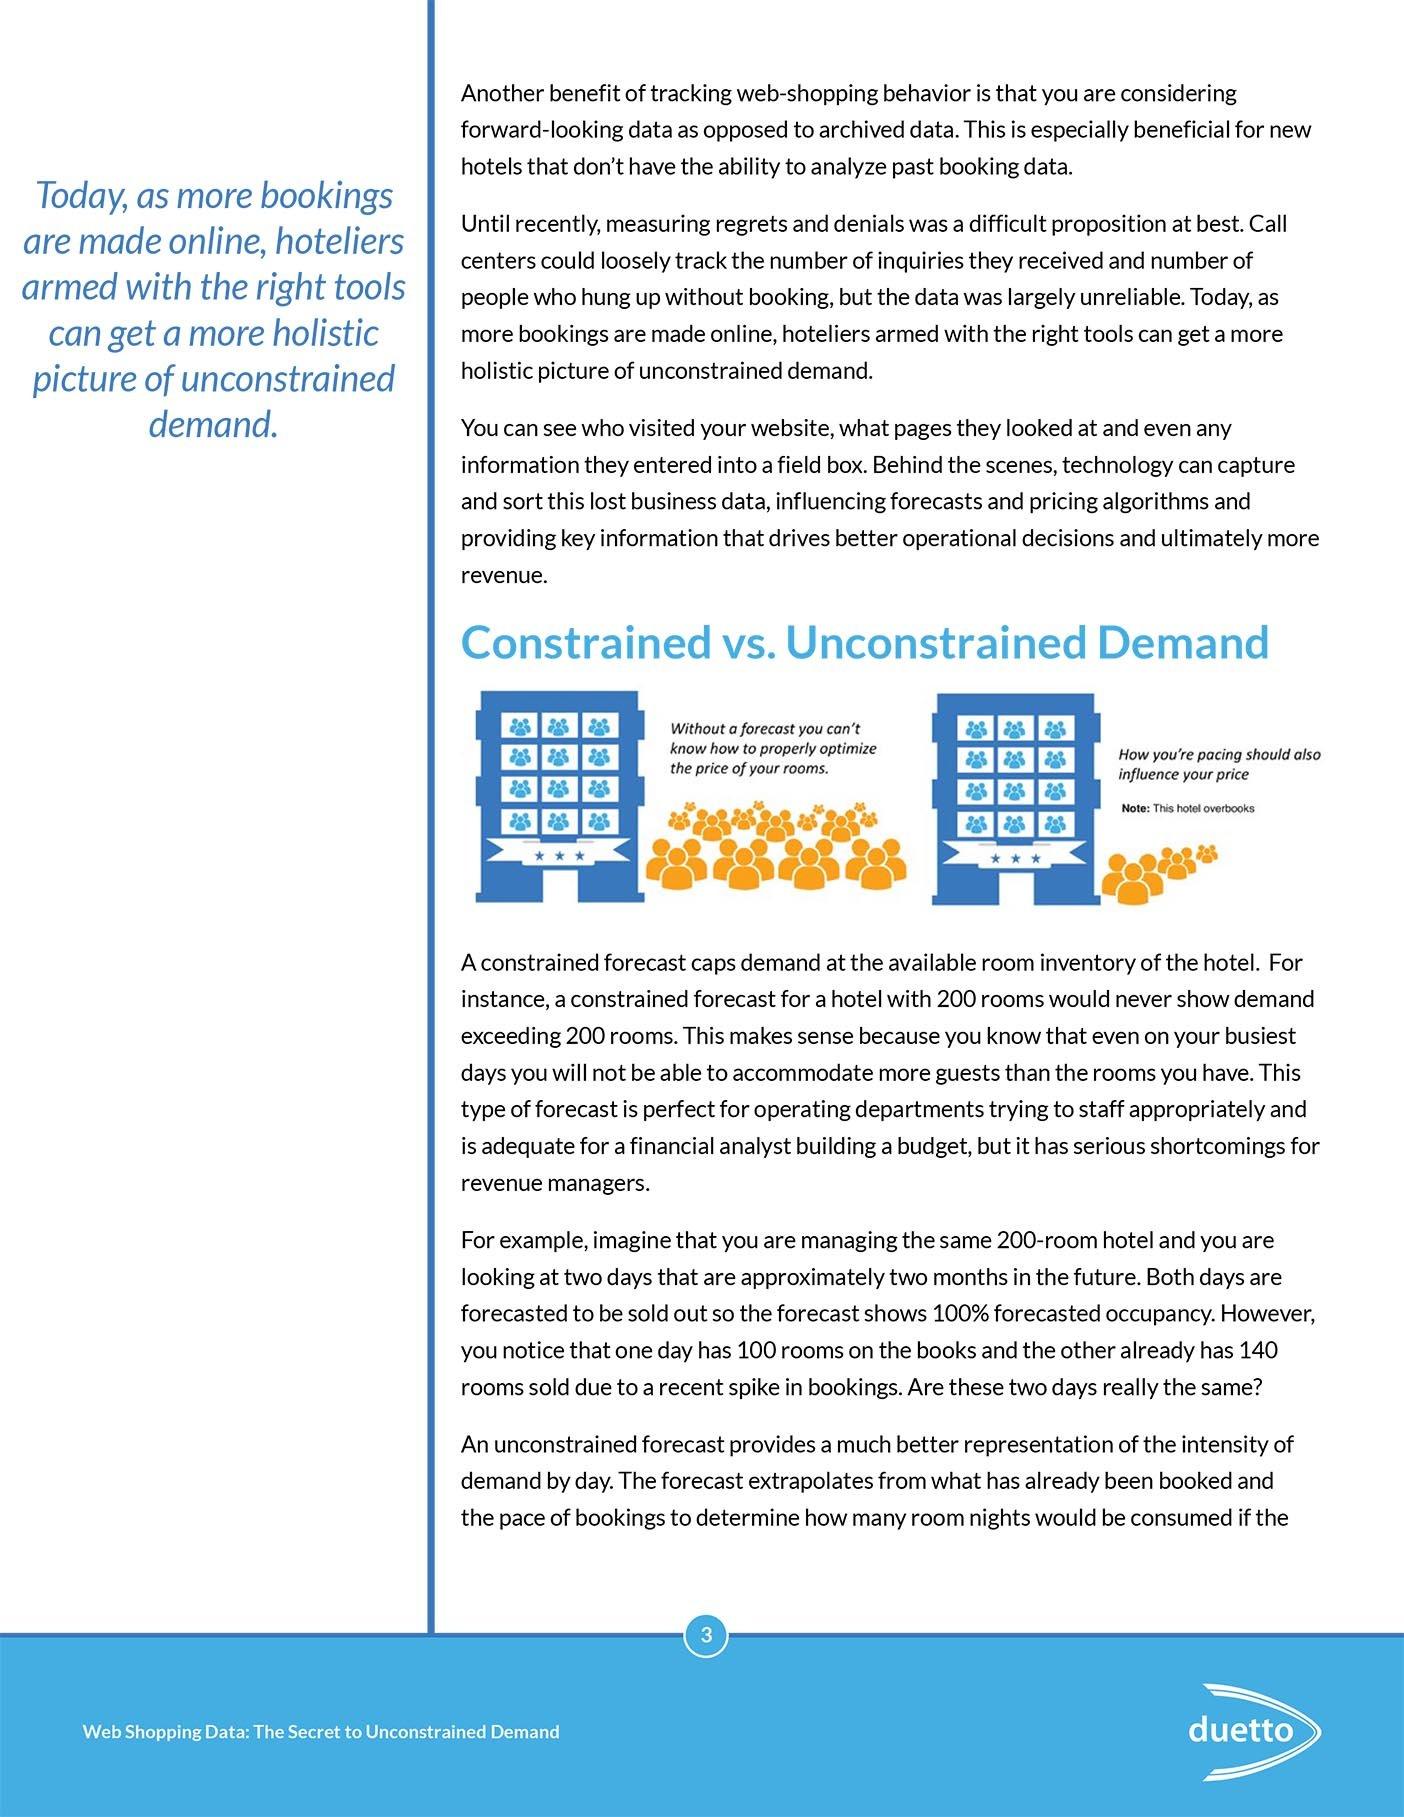 3 web-shopping-data-secret-to-unconstrained-demand-3.jpg